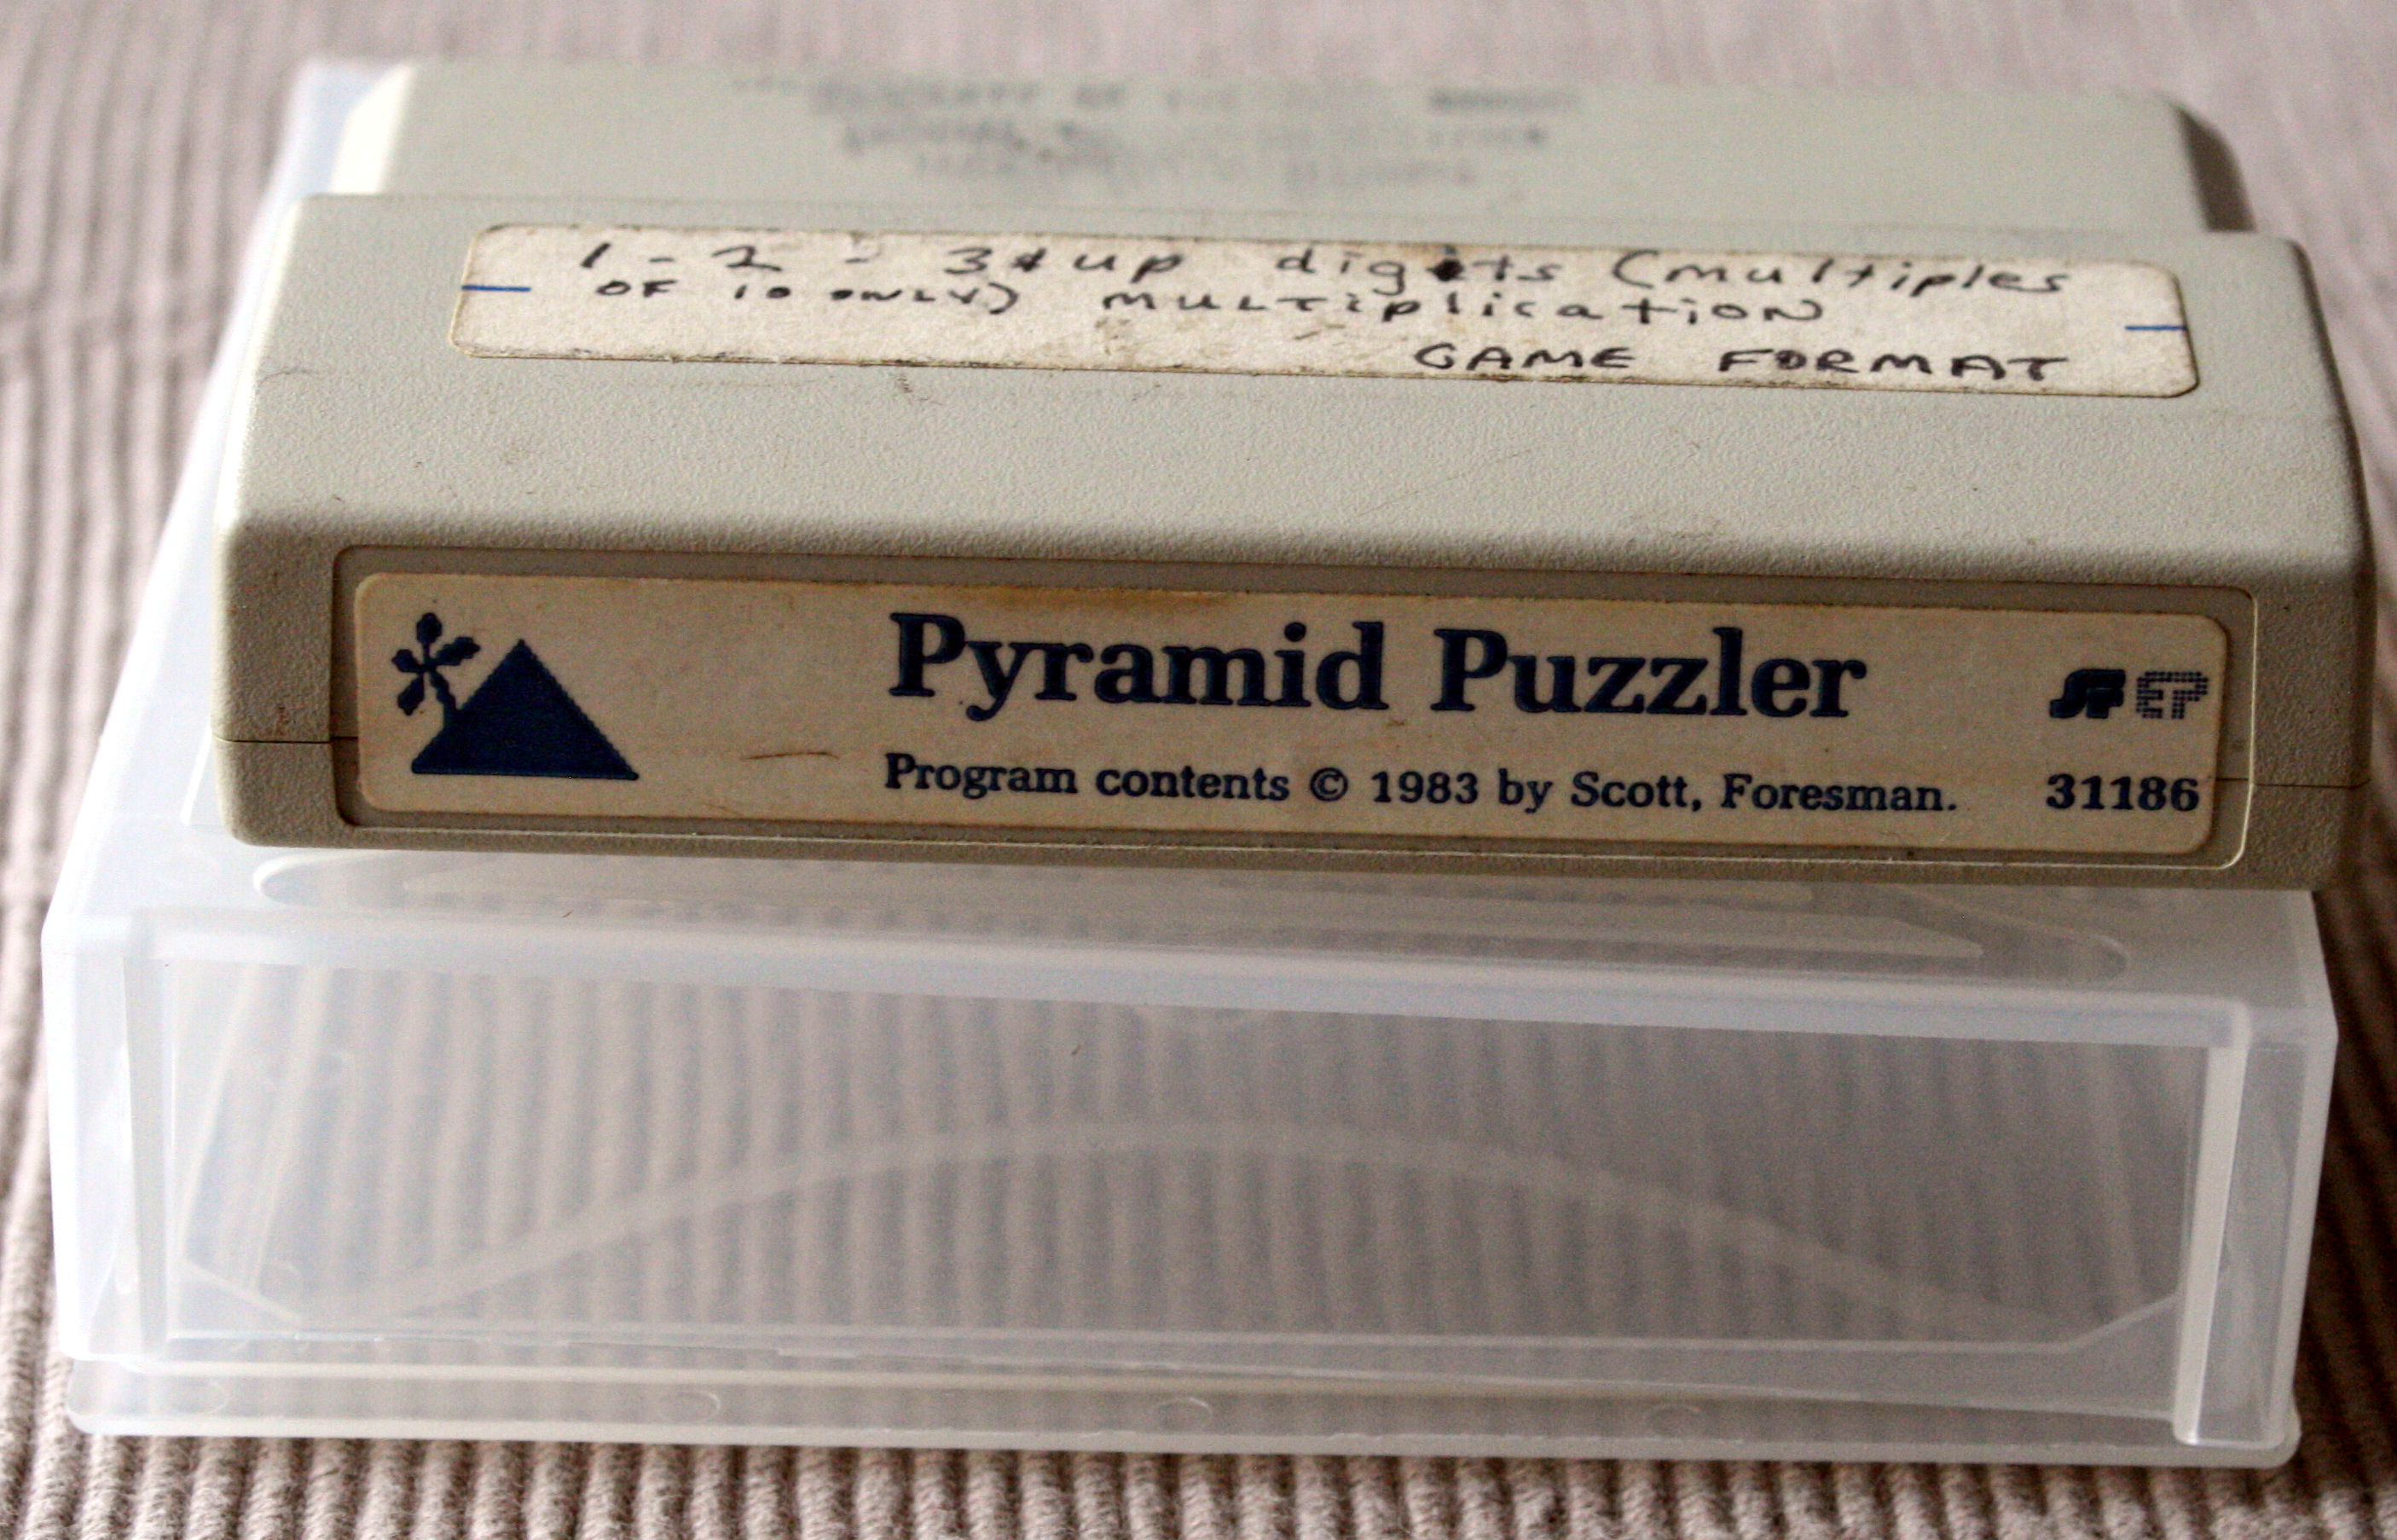 Pyramid Puzzler